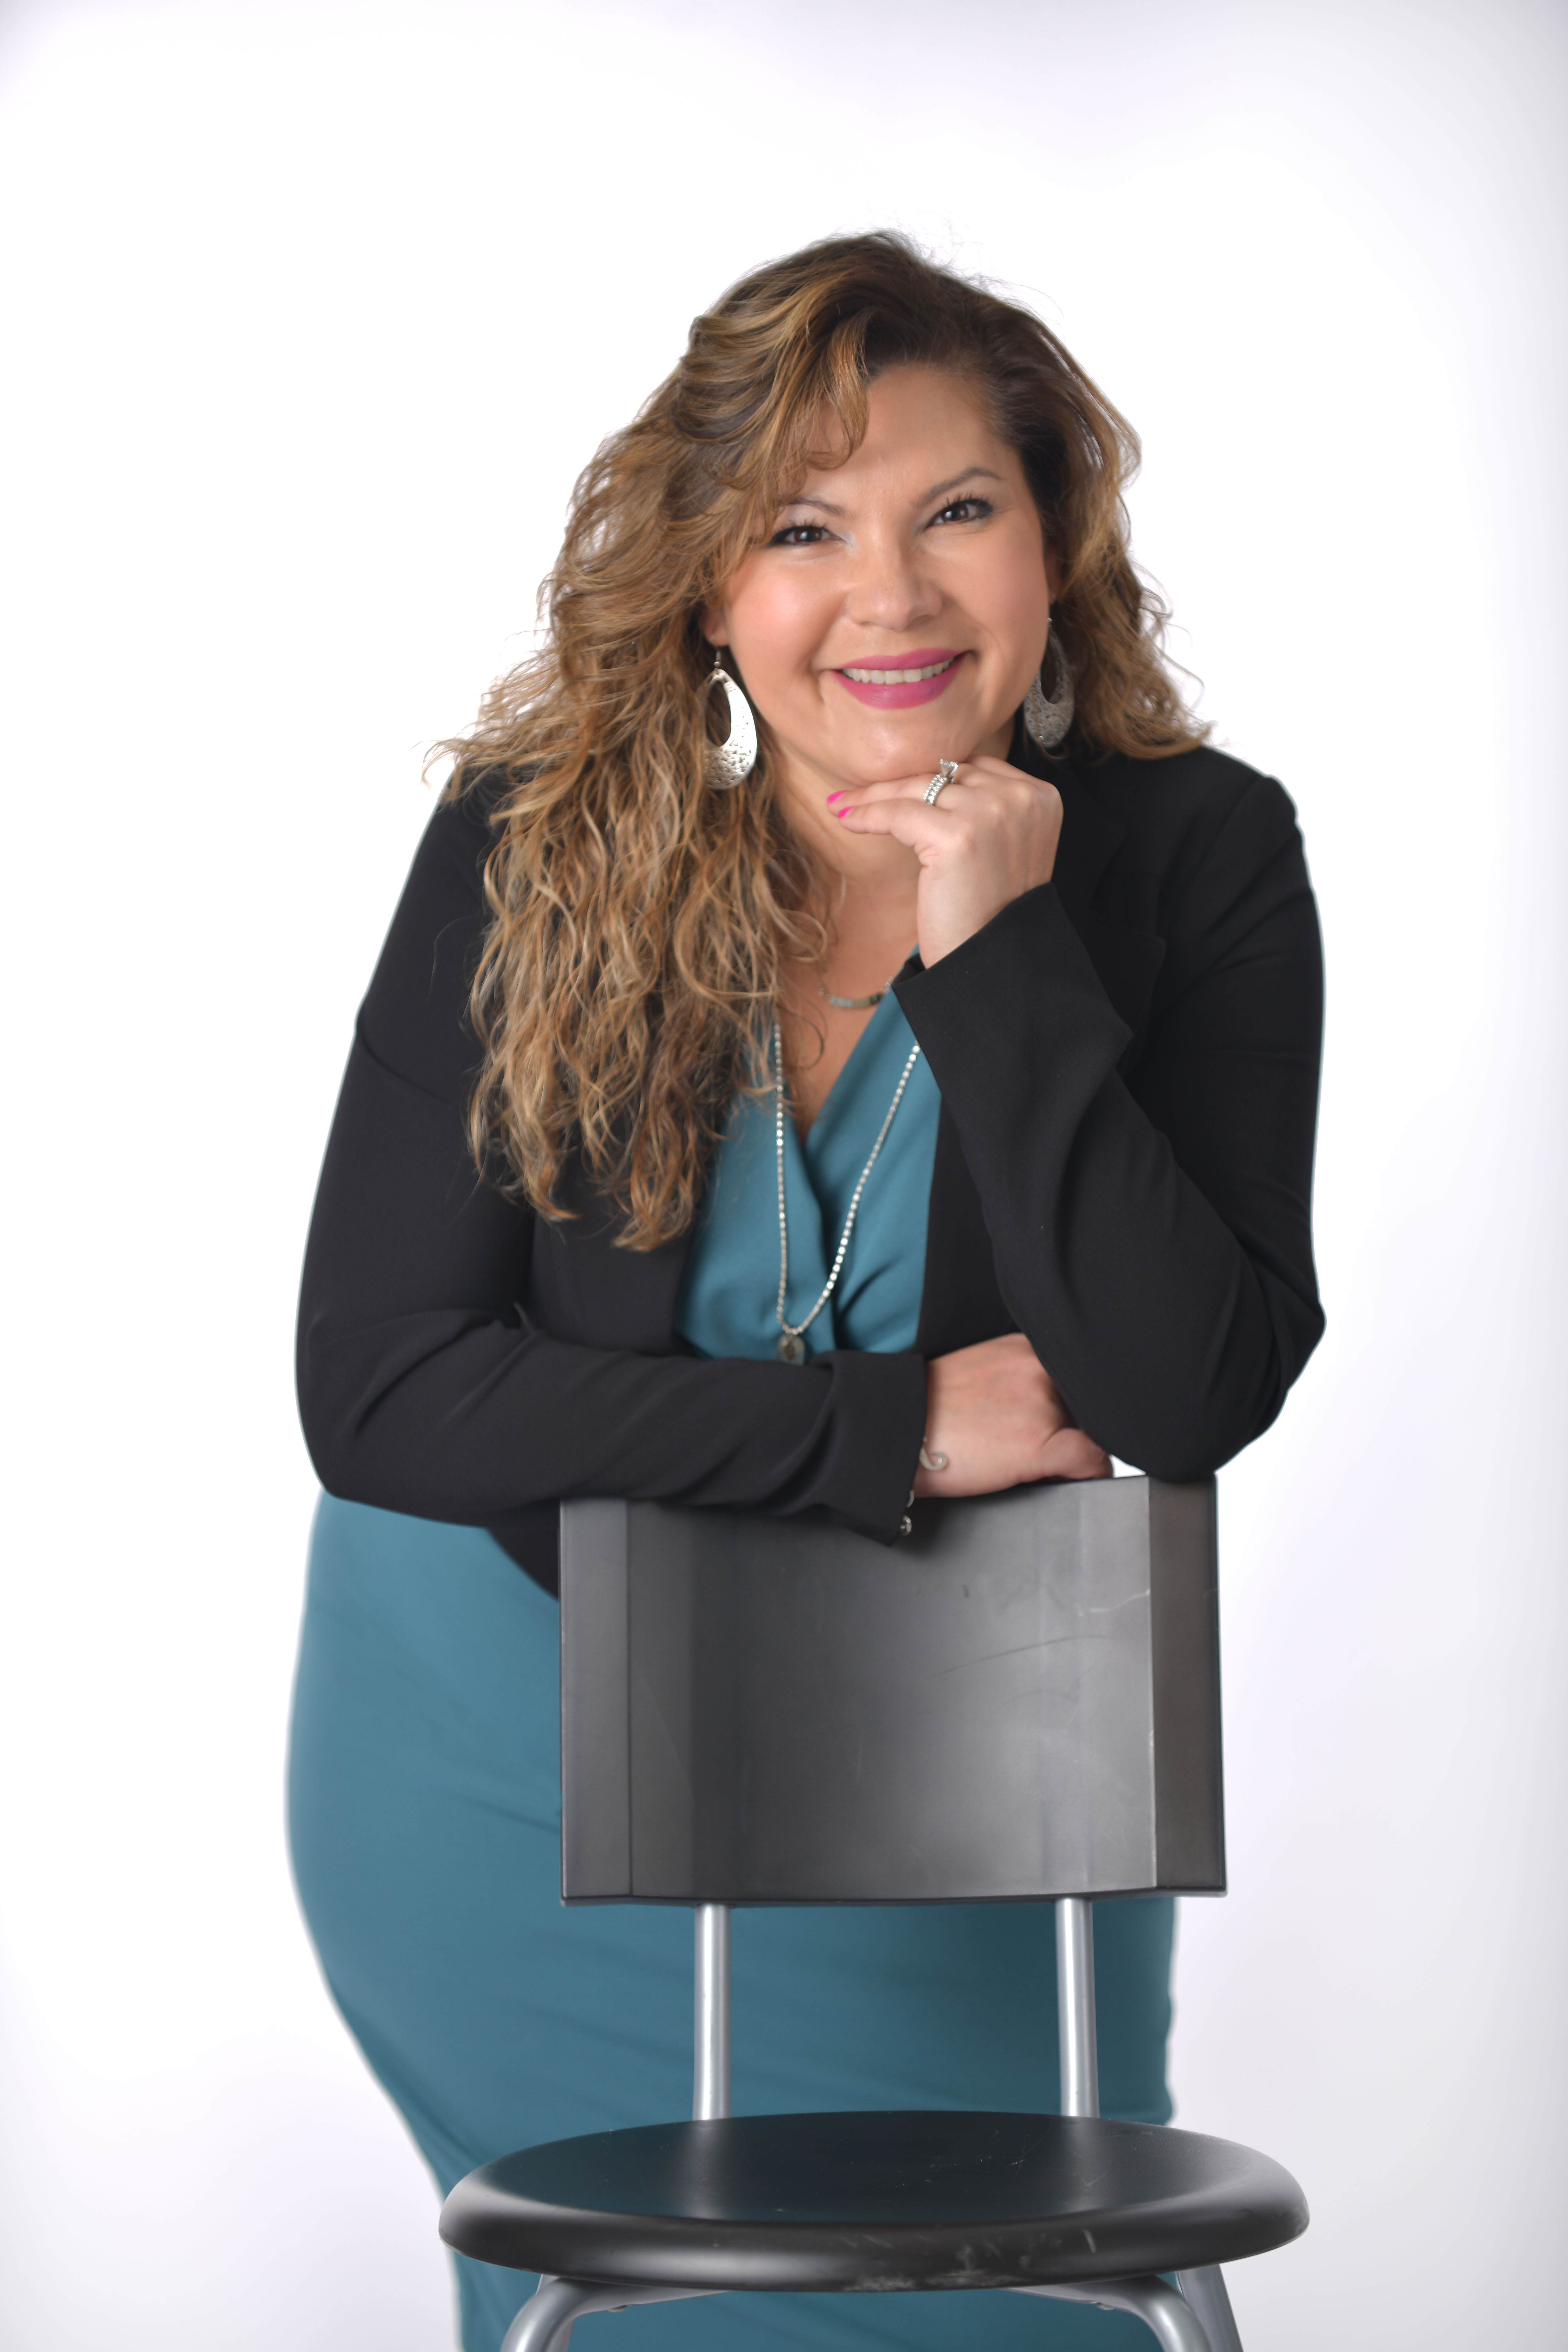 Making the Decision to Run for Judge - Juanita Bocanegra